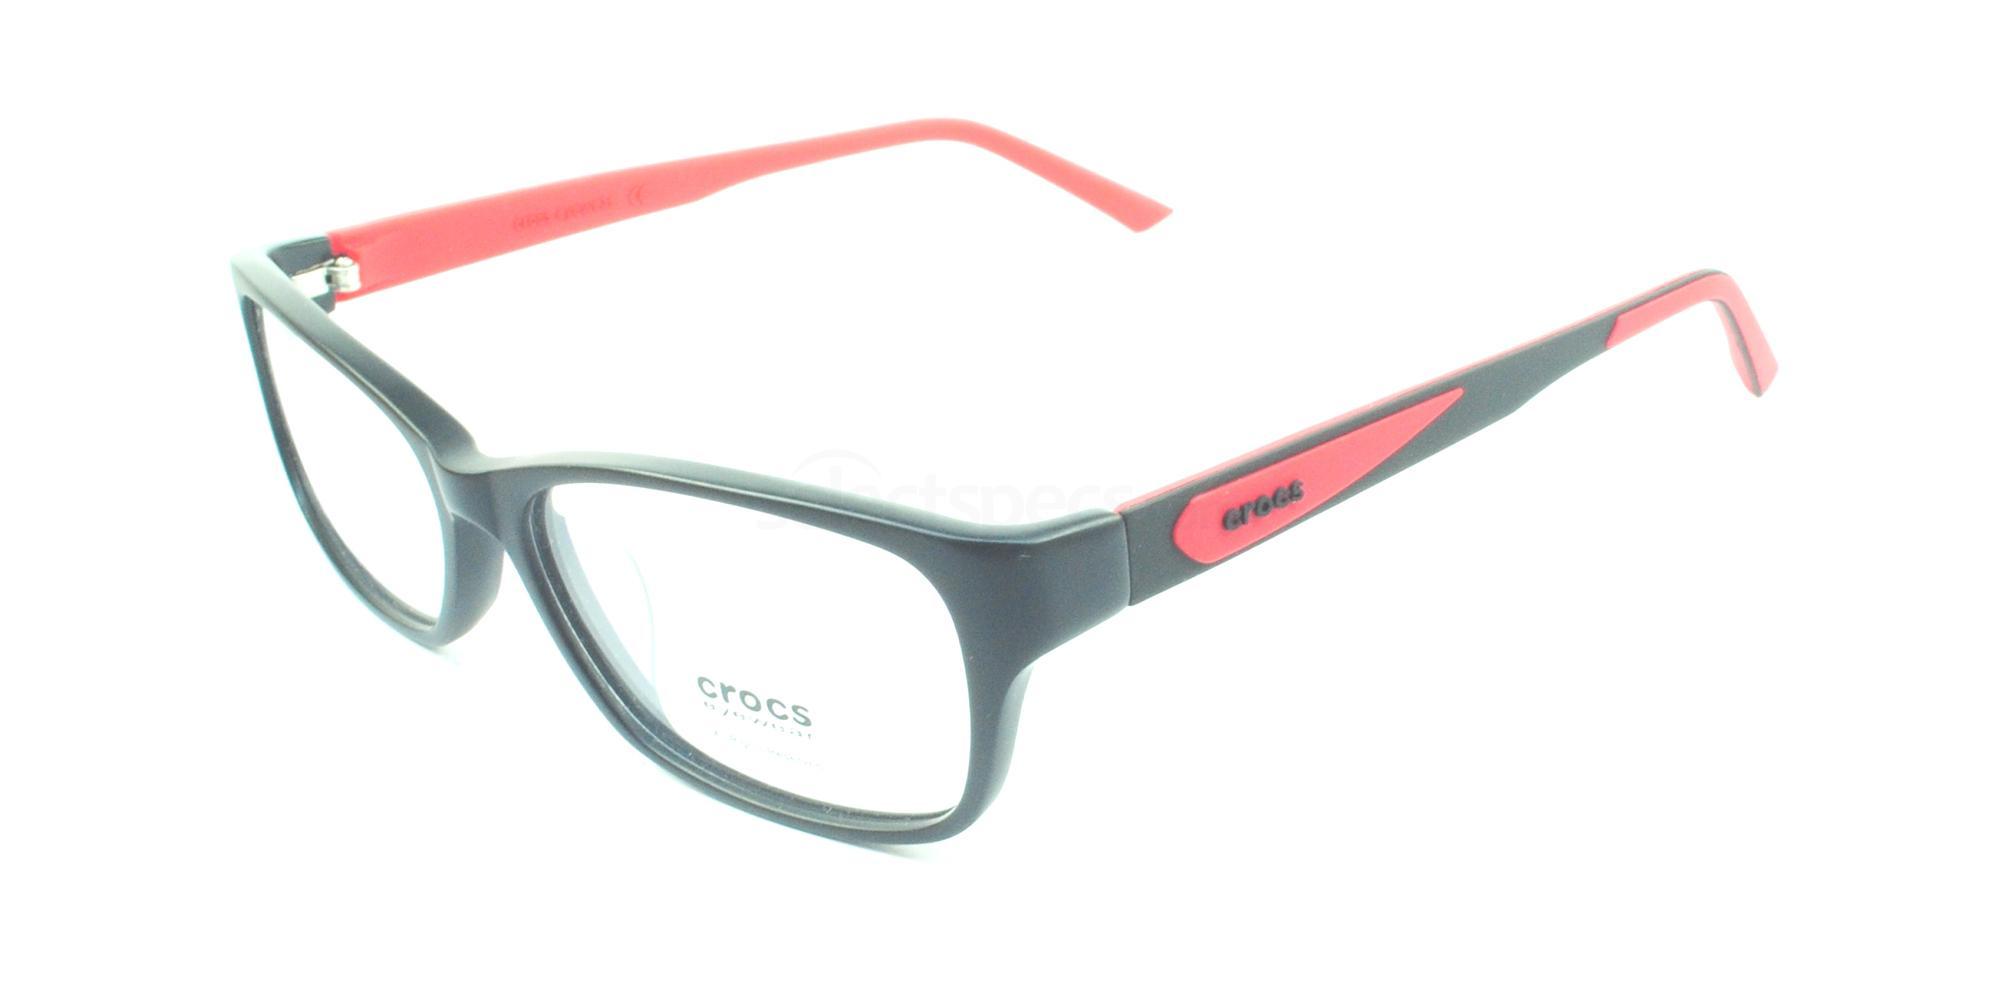 20RD CF 331 Glasses, Crocs Eyewear